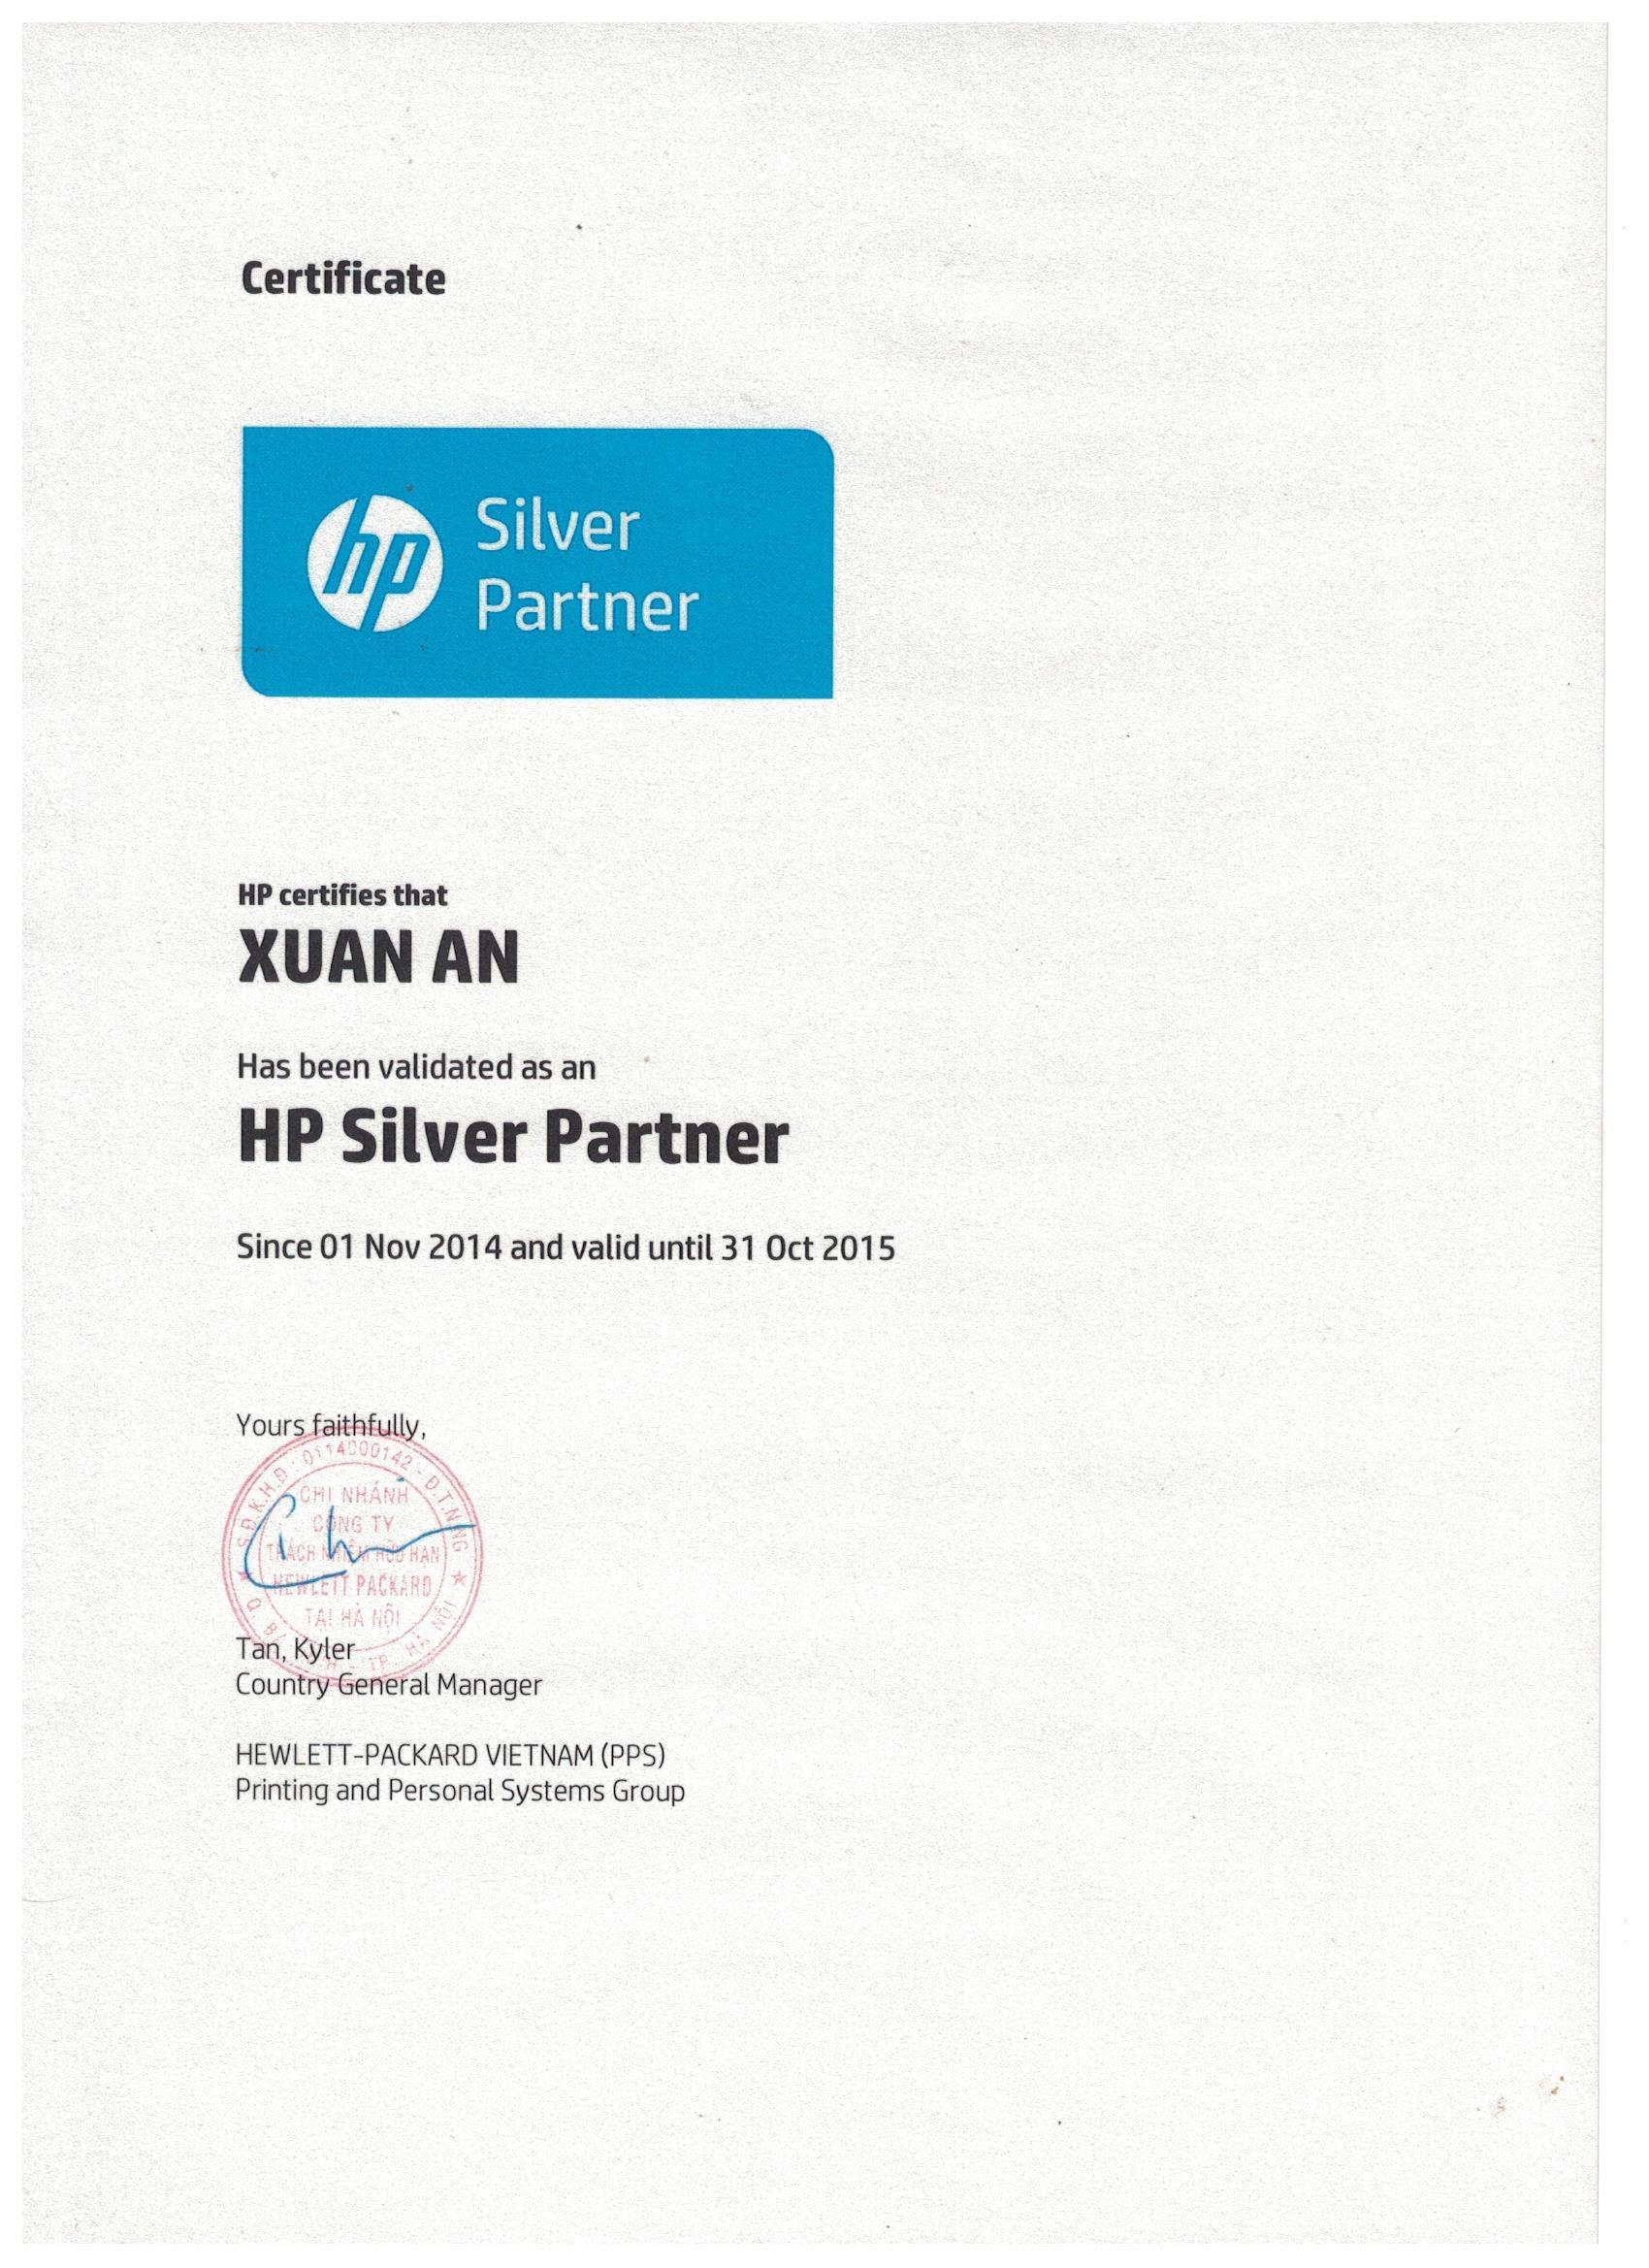 HP Probook 430 G5 - 4SS49PA (Silver)